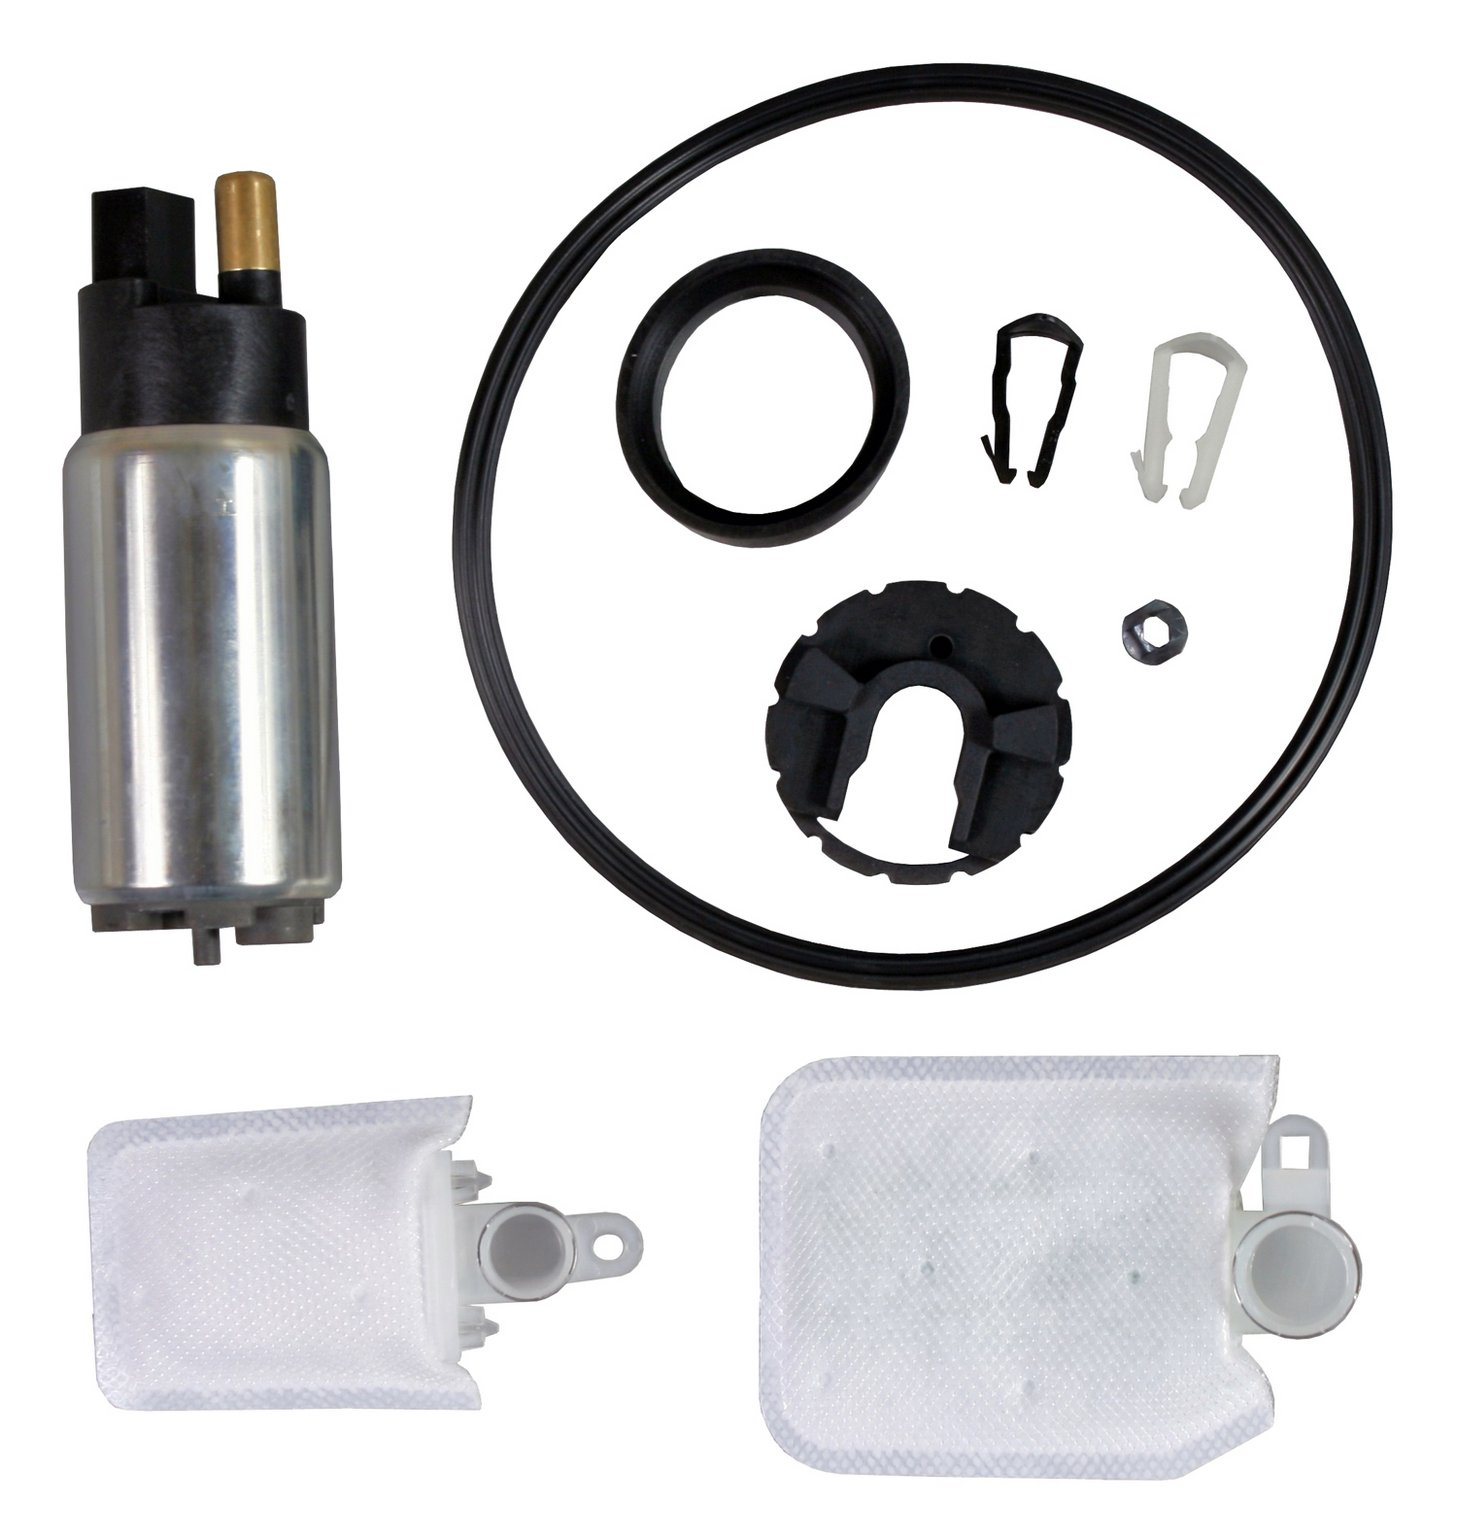 hight resolution of 2000 ford focus fuel pump and strainer set af e2448